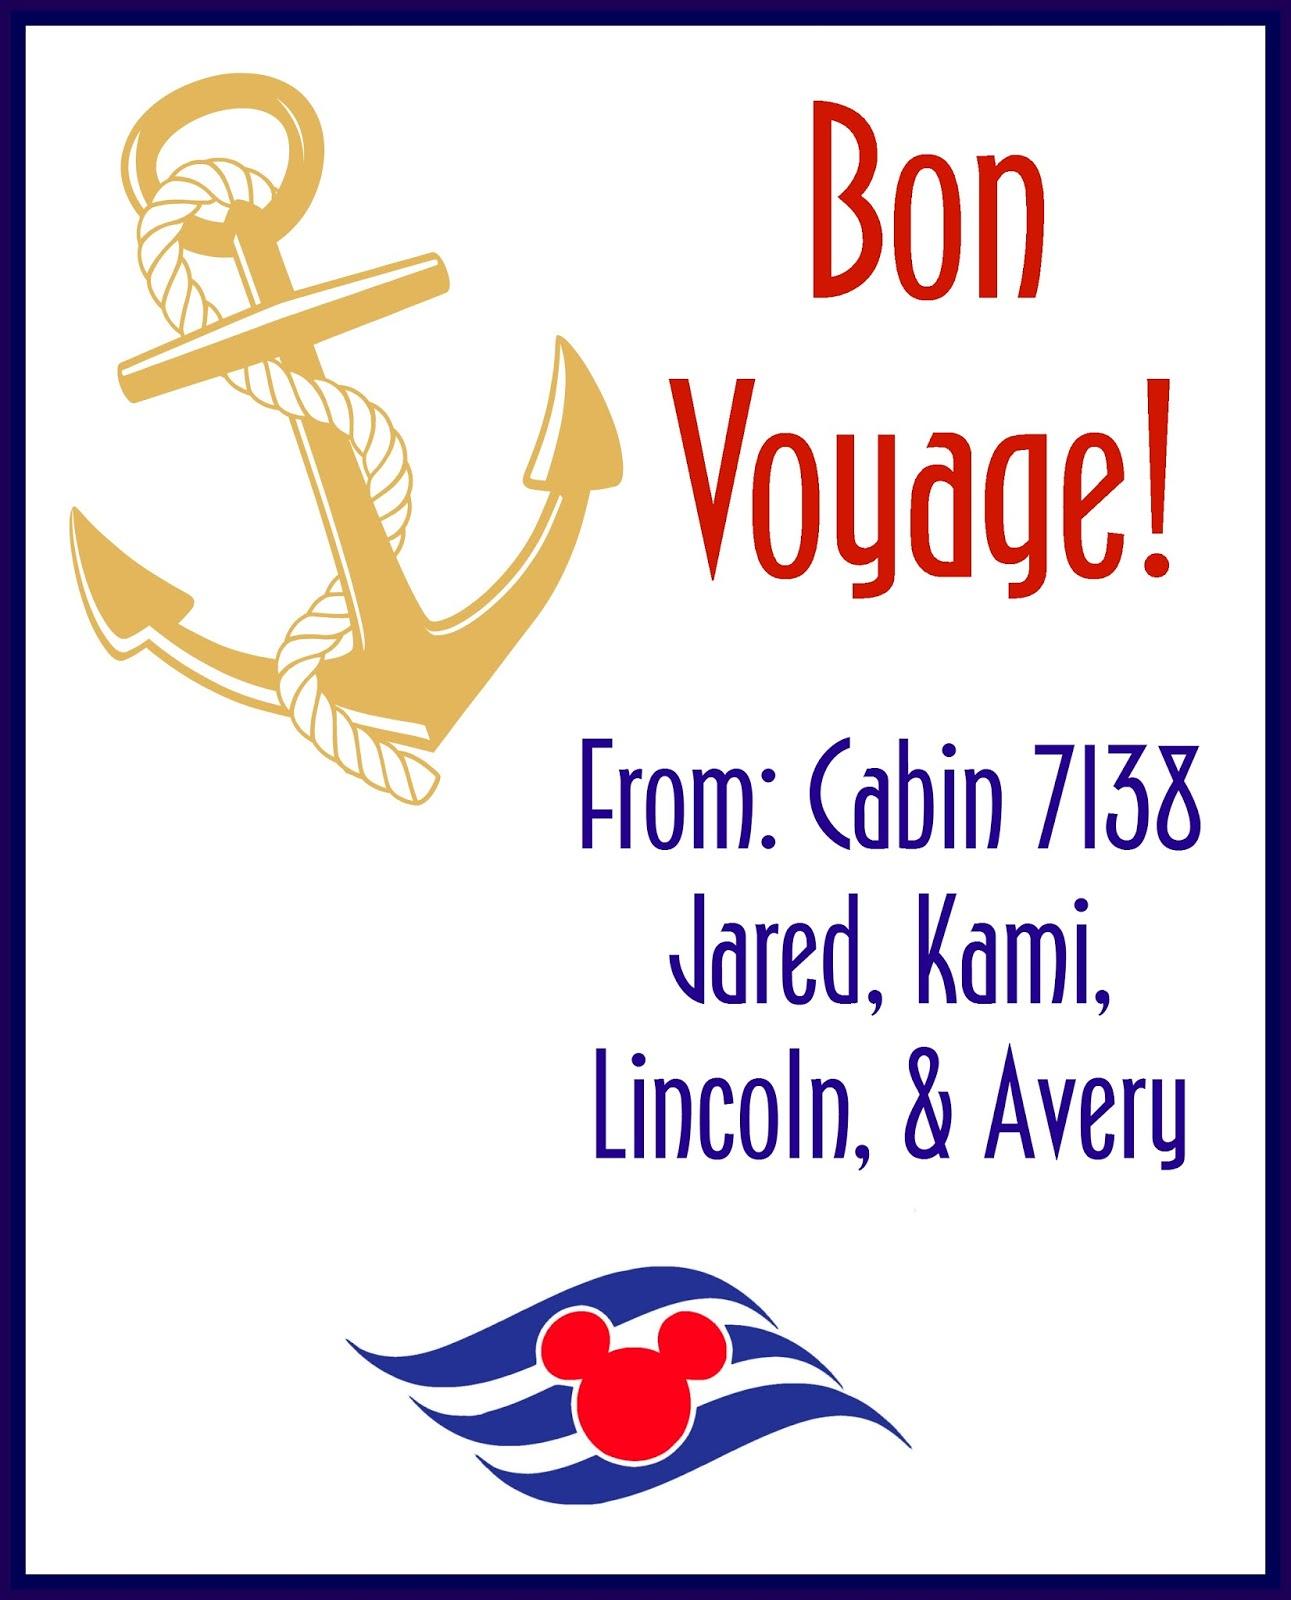 image regarding Mickey Anchor Printable identified as Disney Cruise Fish Extender Printable Reward Tags - The Momma